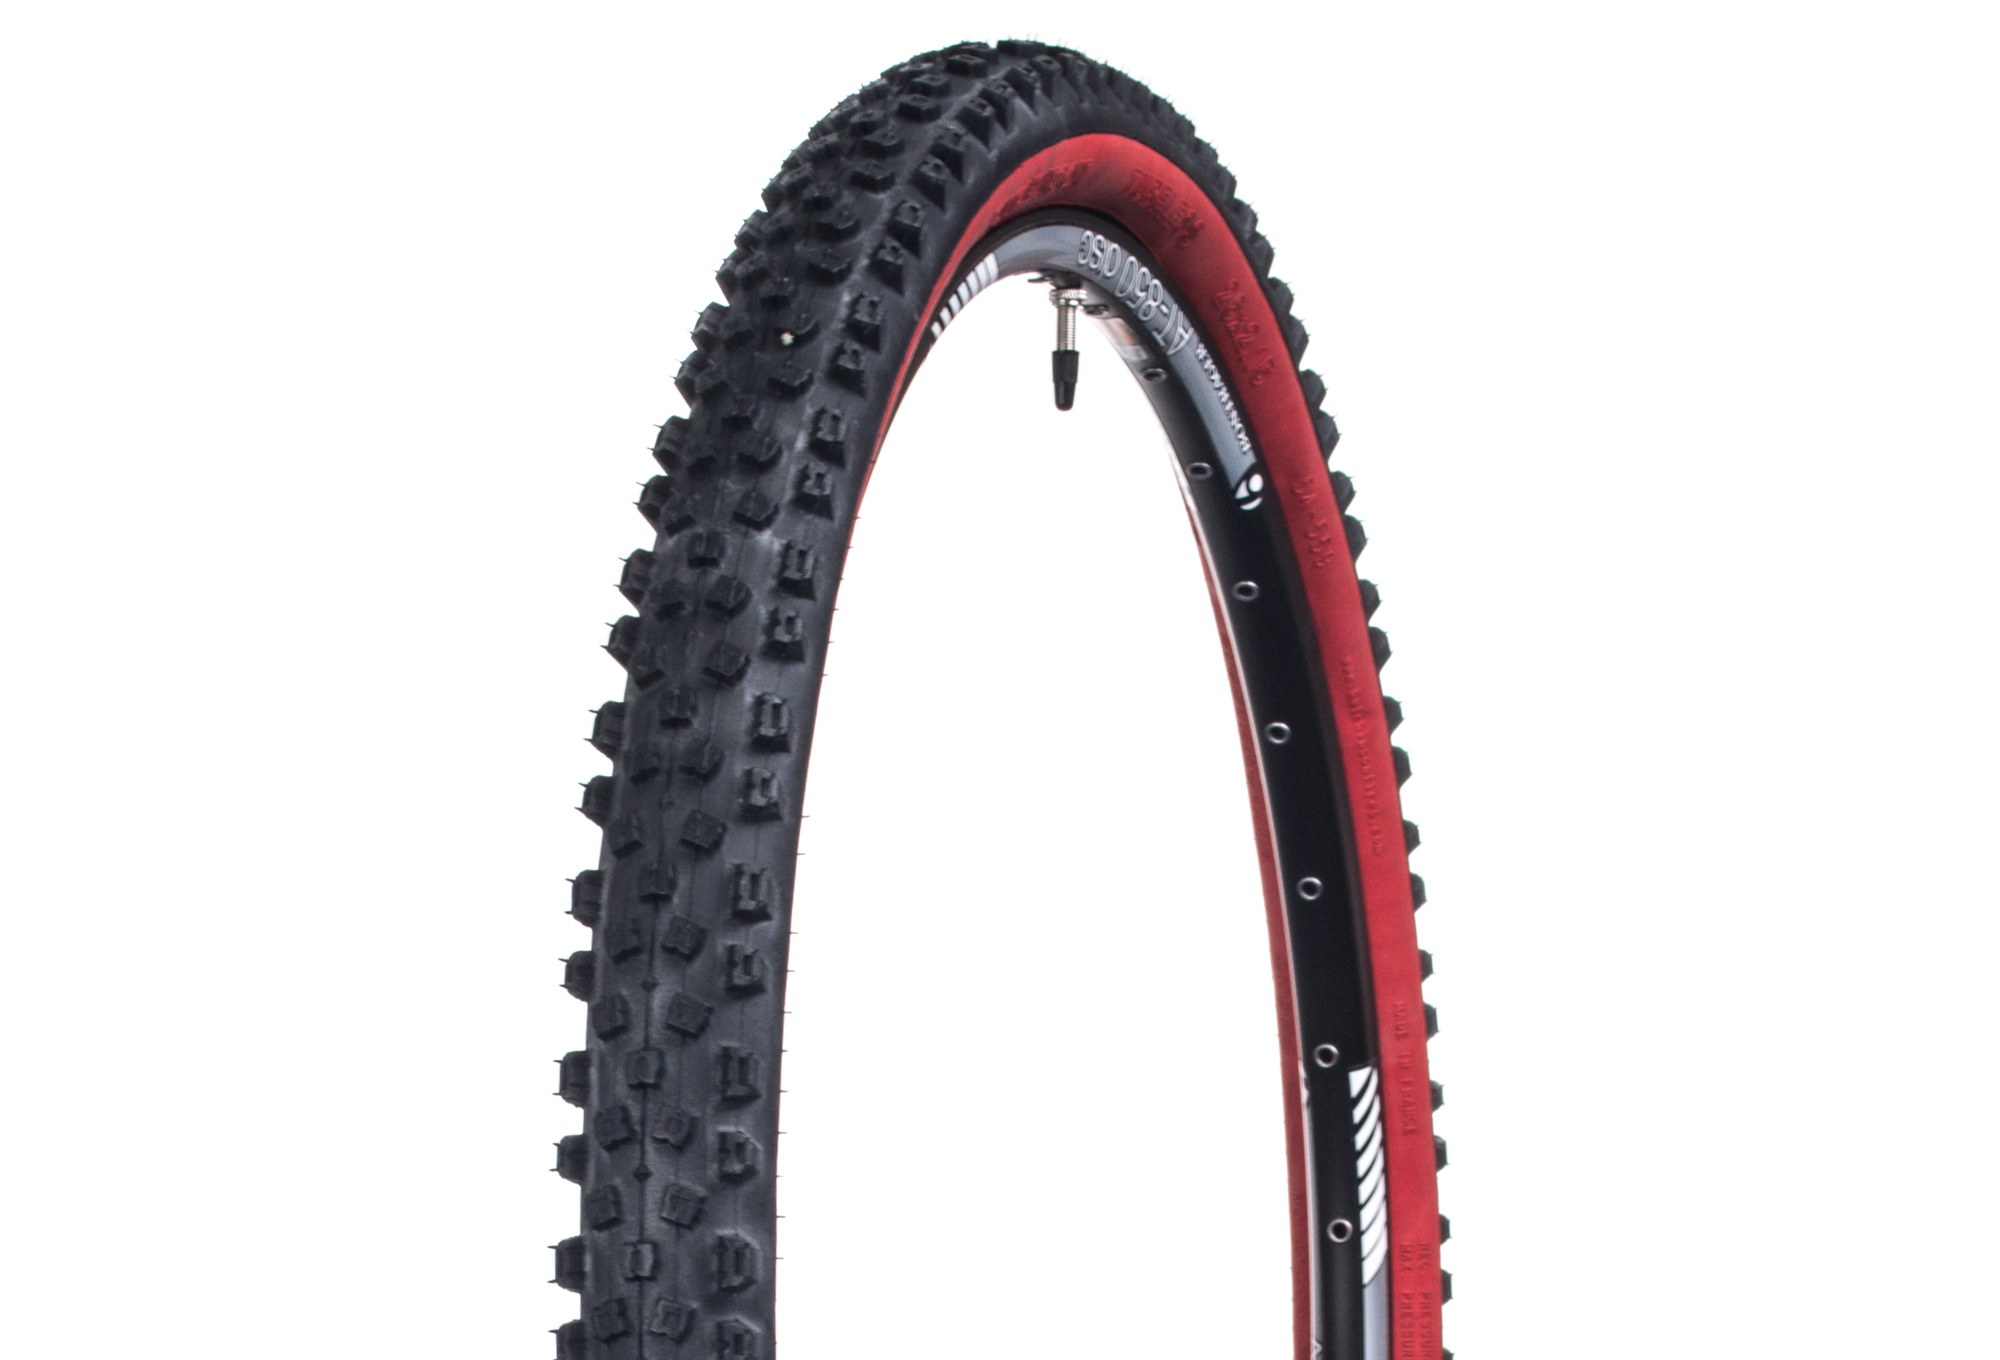 hutchinson pneu vtt toro 26 hardskin raceripost tl ready souple noir rouge. Black Bedroom Furniture Sets. Home Design Ideas